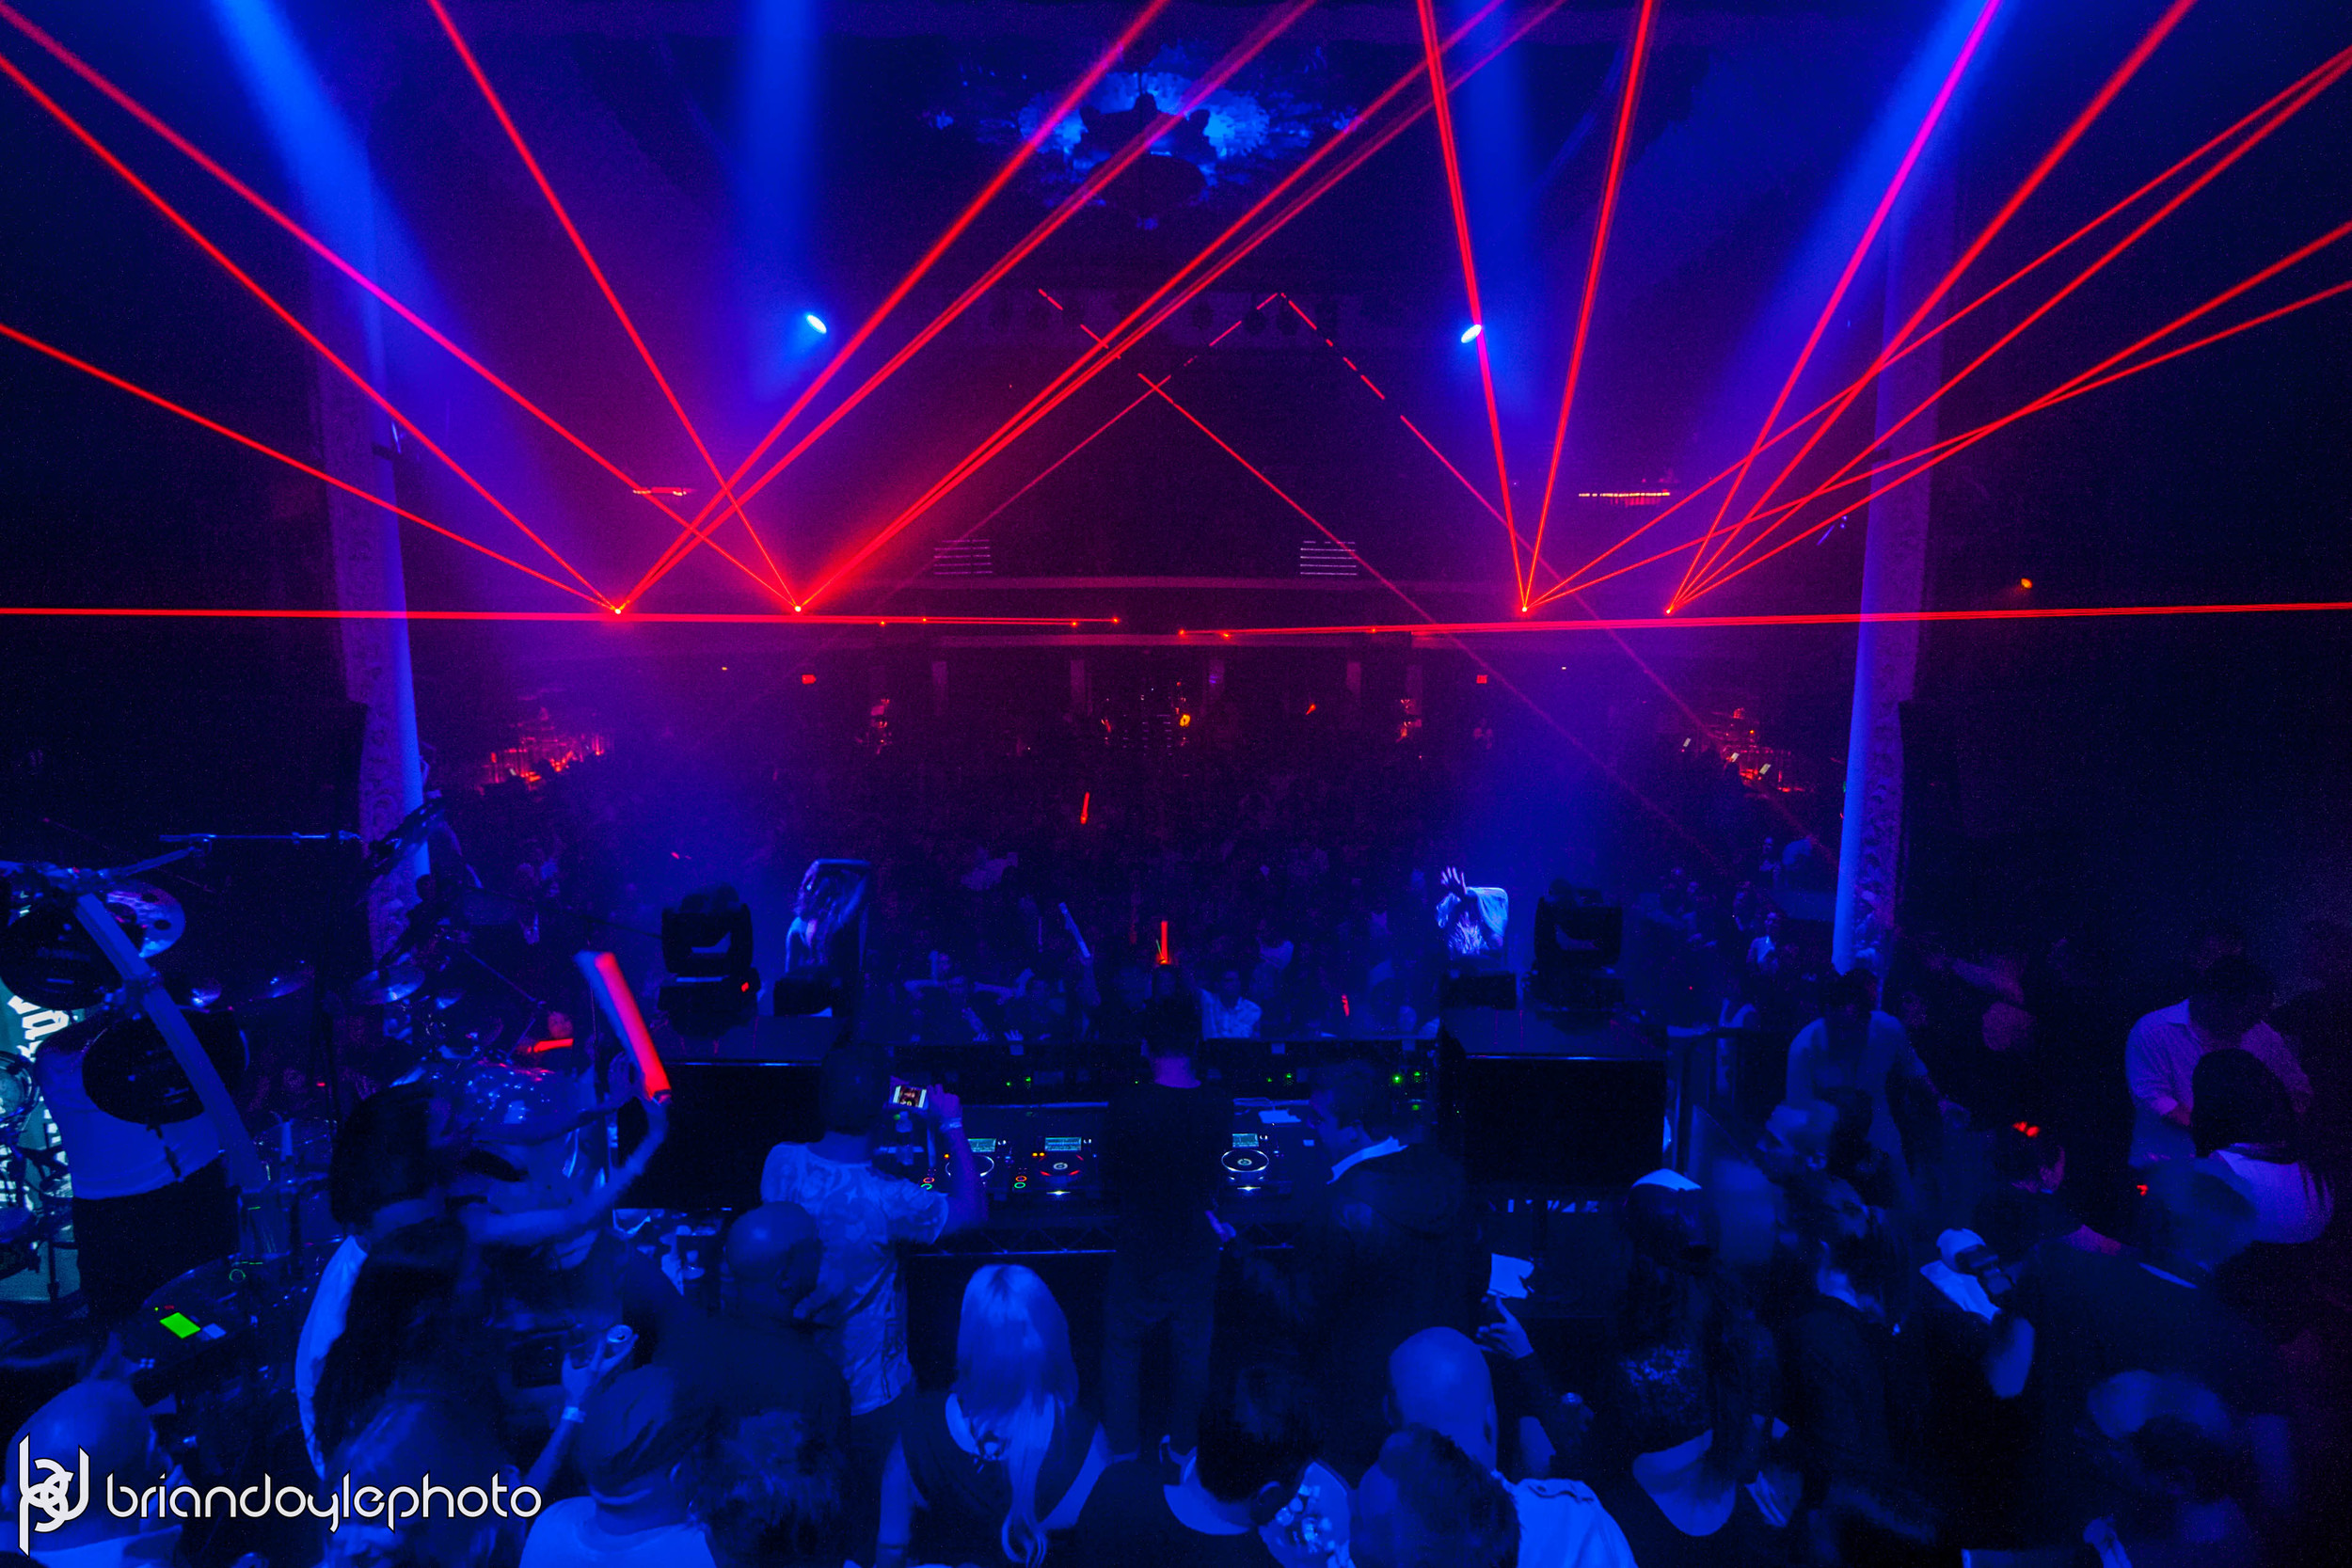 Jagermeister Presents - Paul Oakenfold @ Avalon bdp 27.09.14-50.jpg